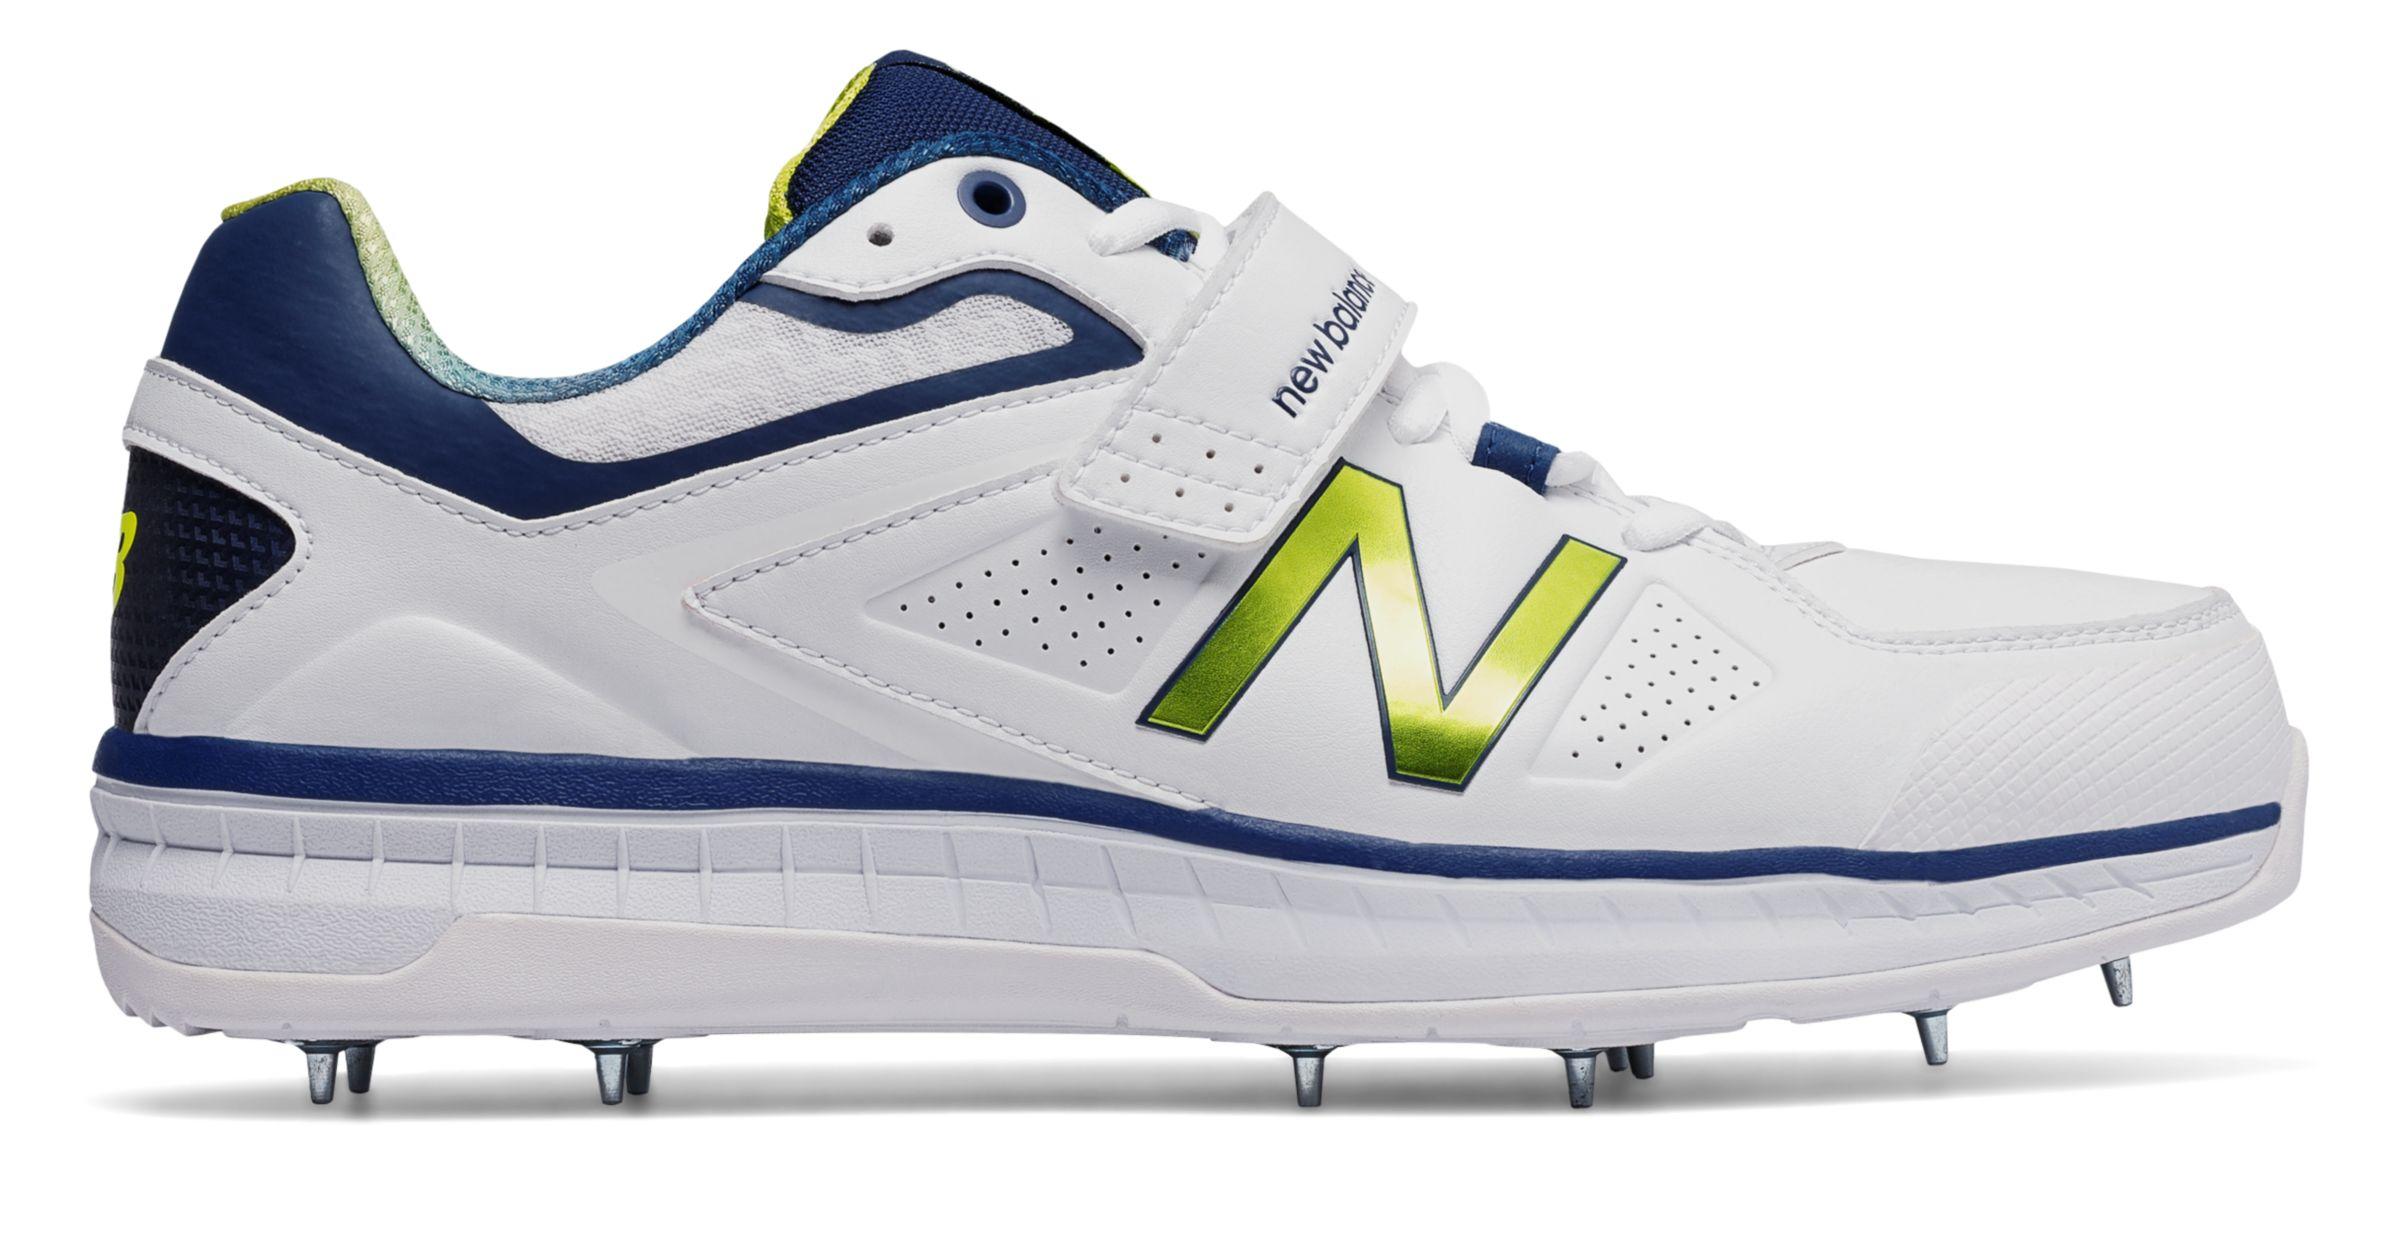 New Balance : New Balance 4040v3 : Men's Cricket : CK4040N3